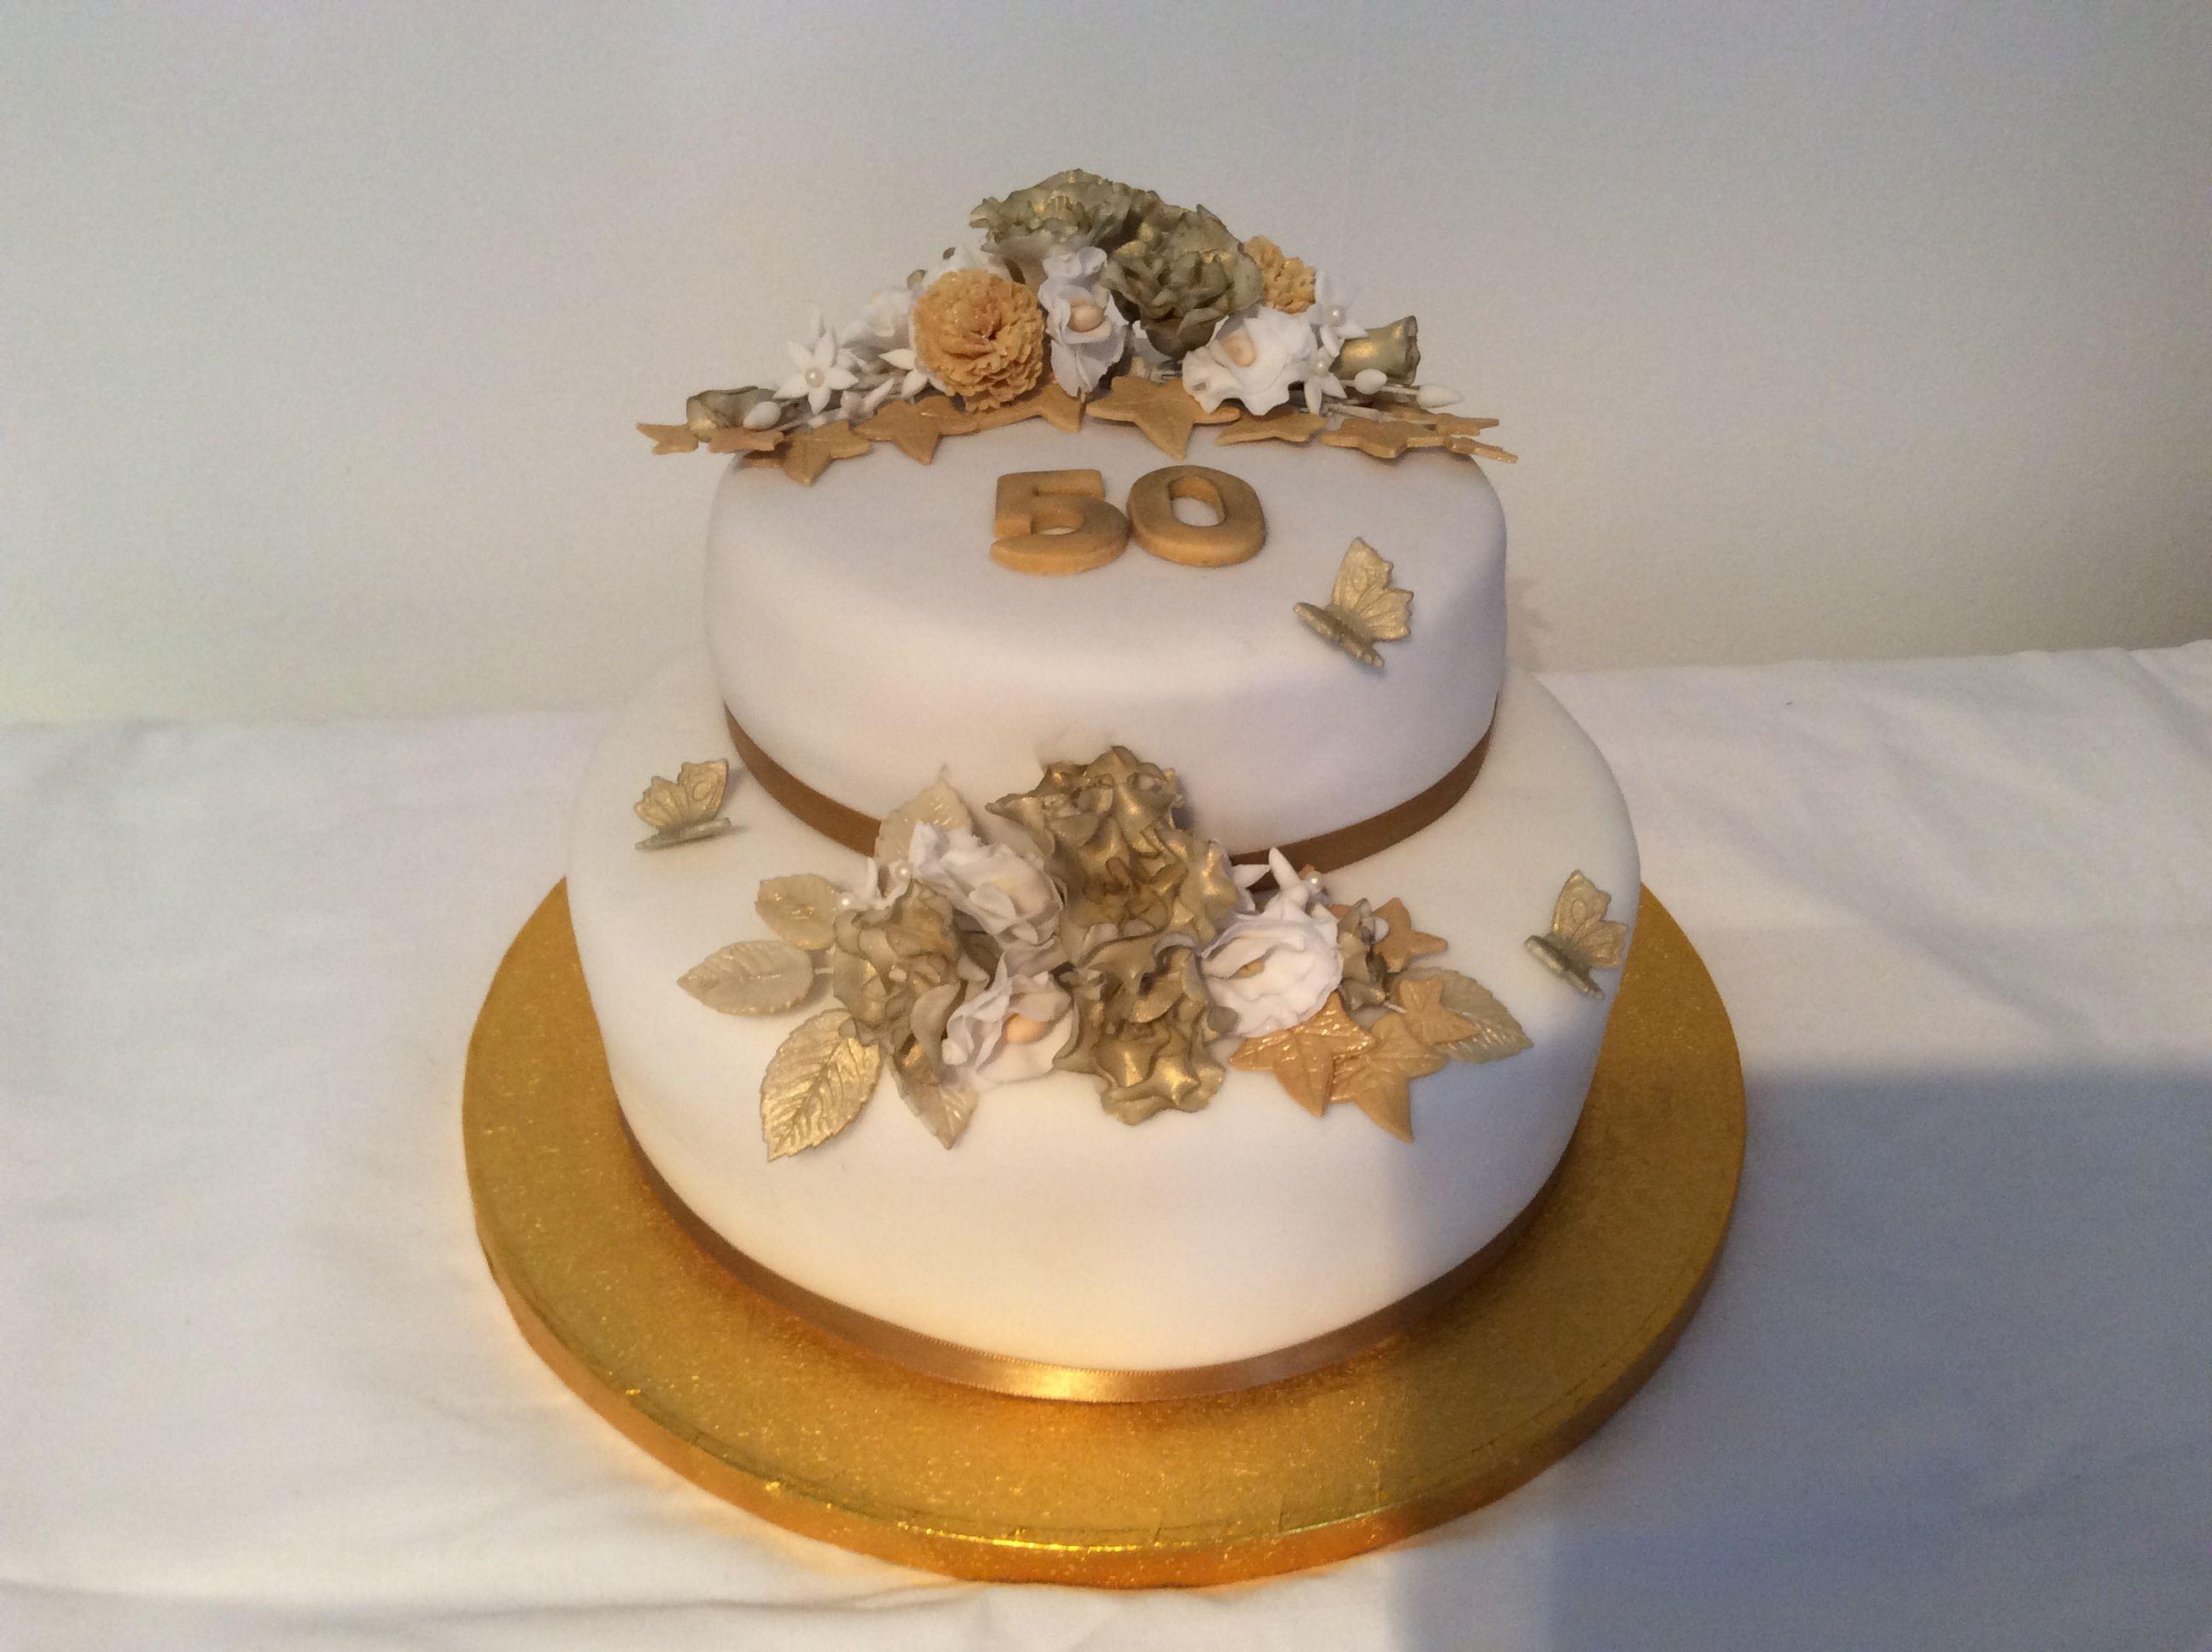 Mg golden wedding rose cake wedding anniversary cakes pinterest